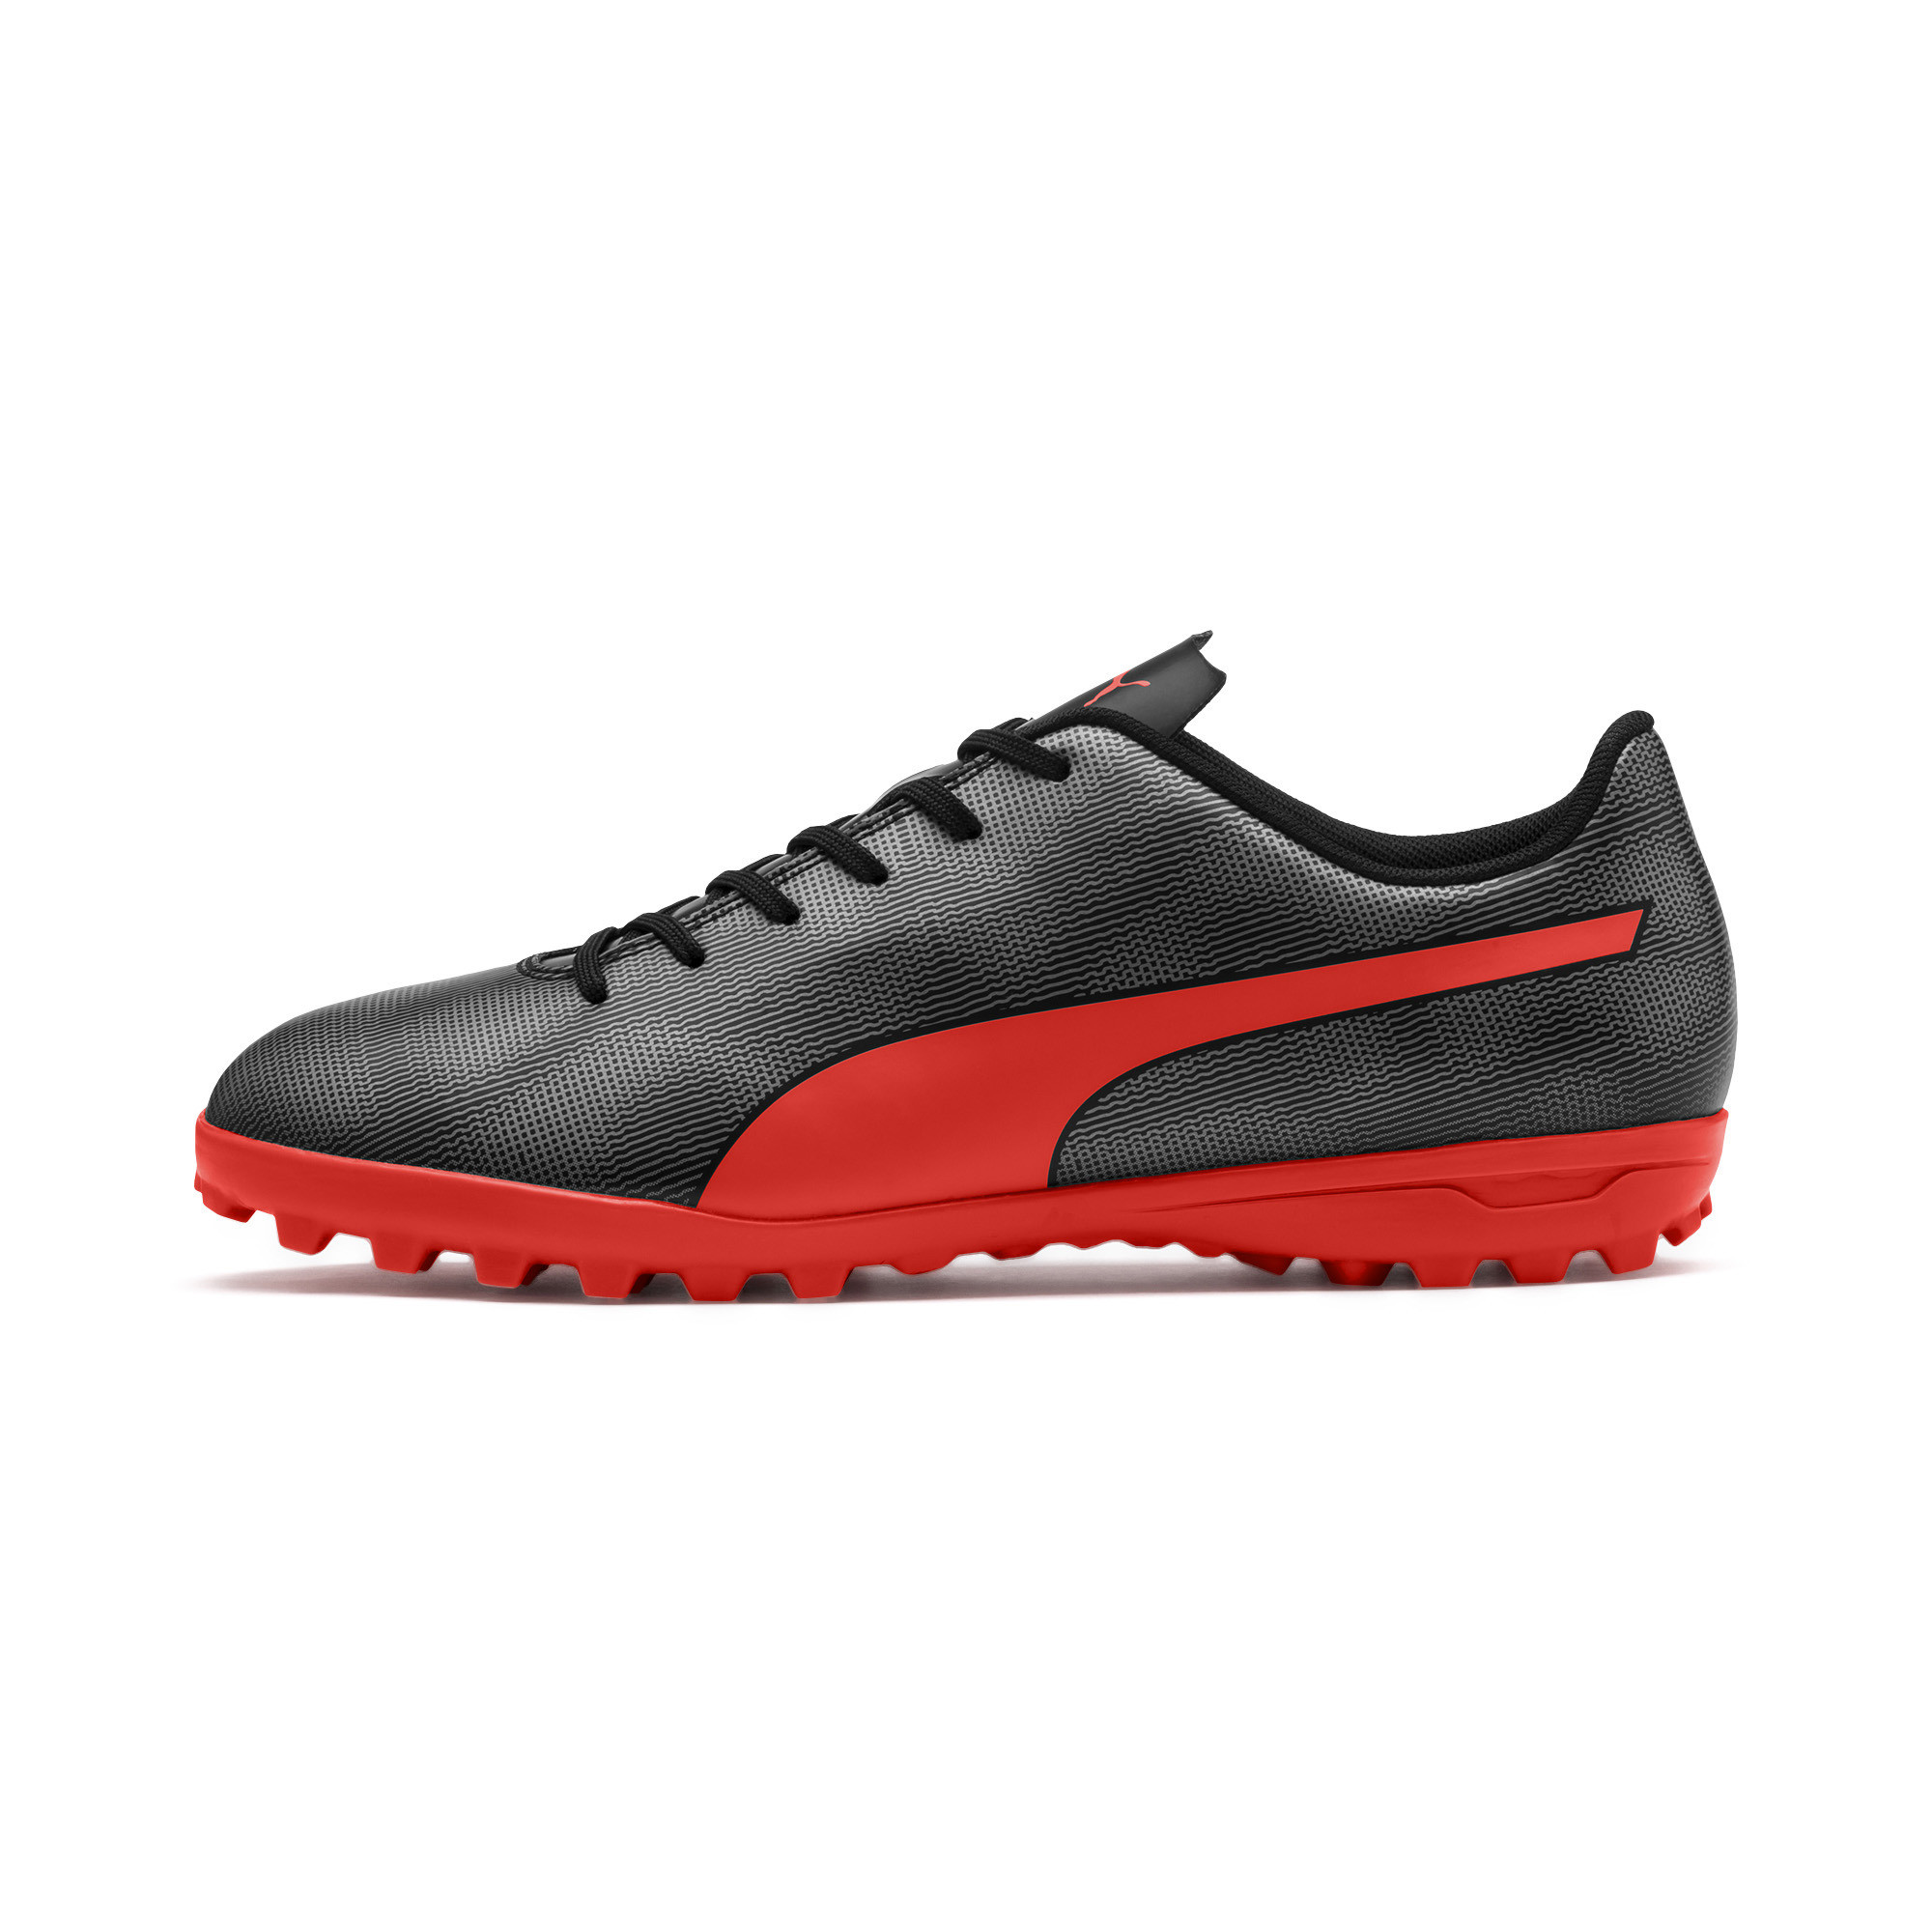 PUMA-Rapido-TT-Men-s-Soccer-Cleats-Men-Shoe-Football thumbnail 4